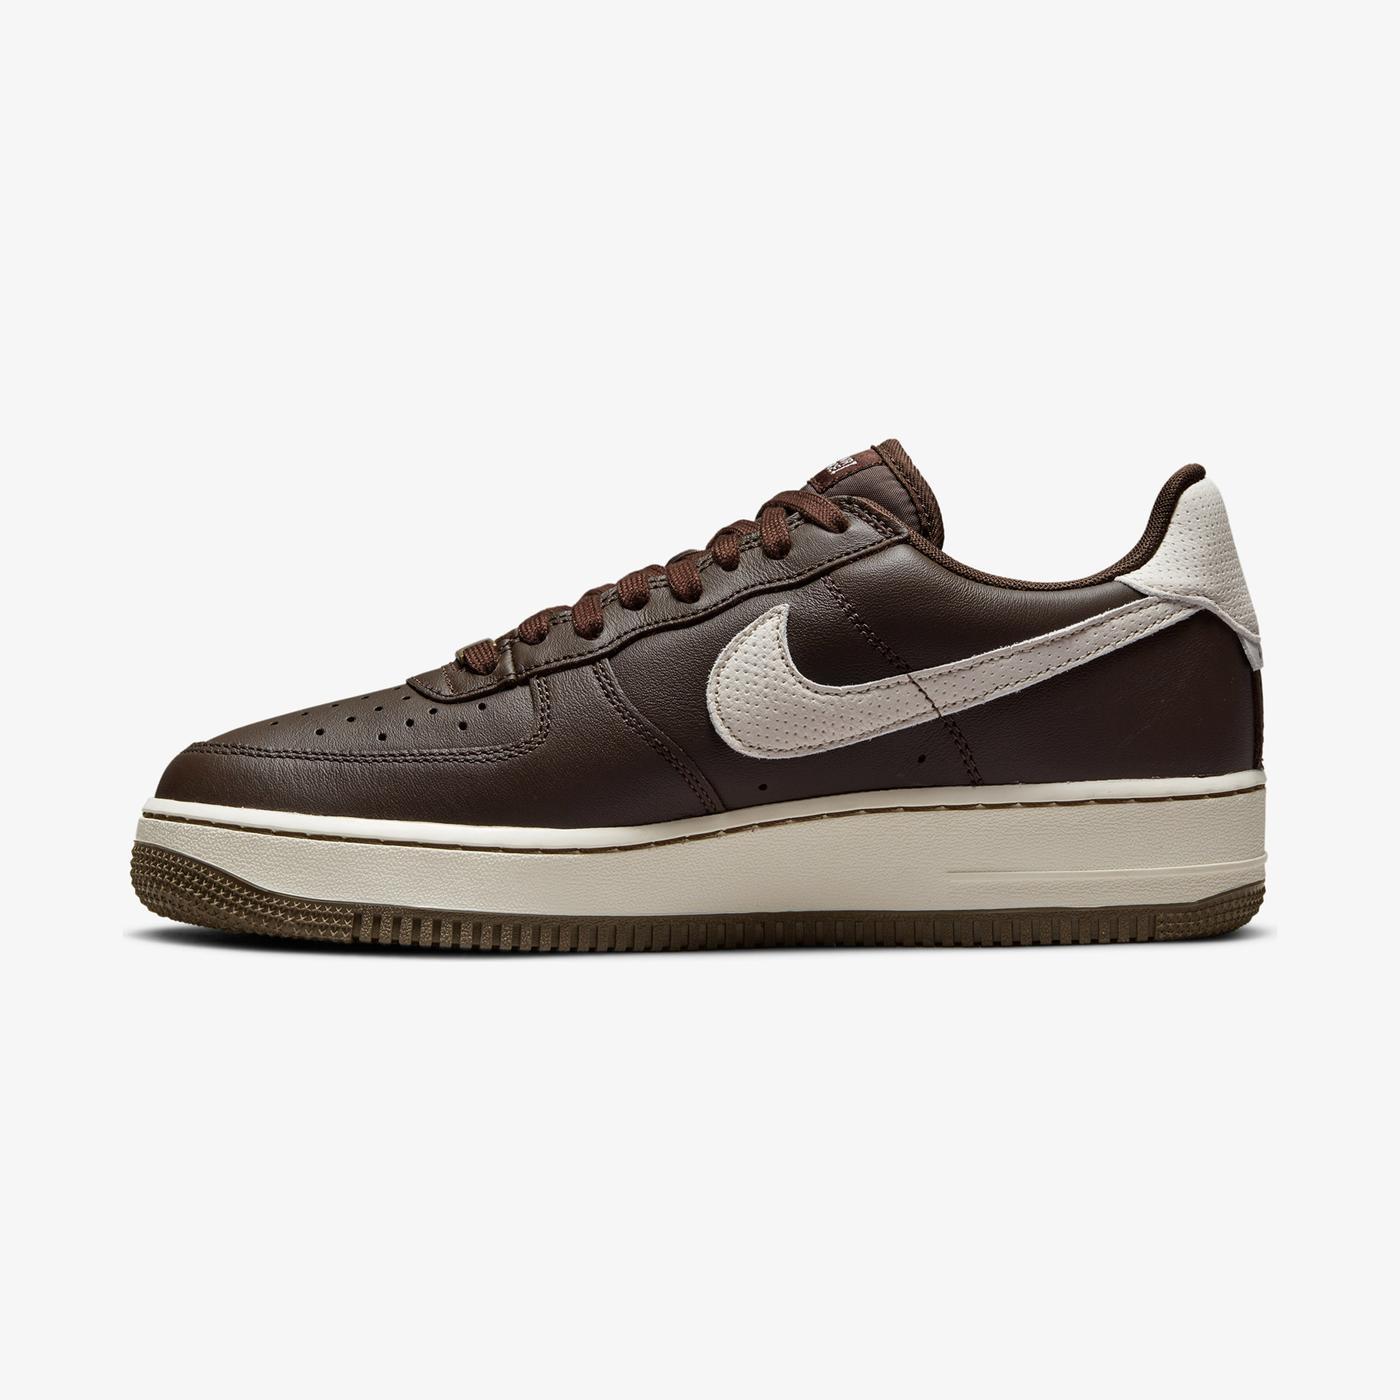 Nike Air Force 1 '07 Craft Erkek Kahverengi Spor Ayakkabı